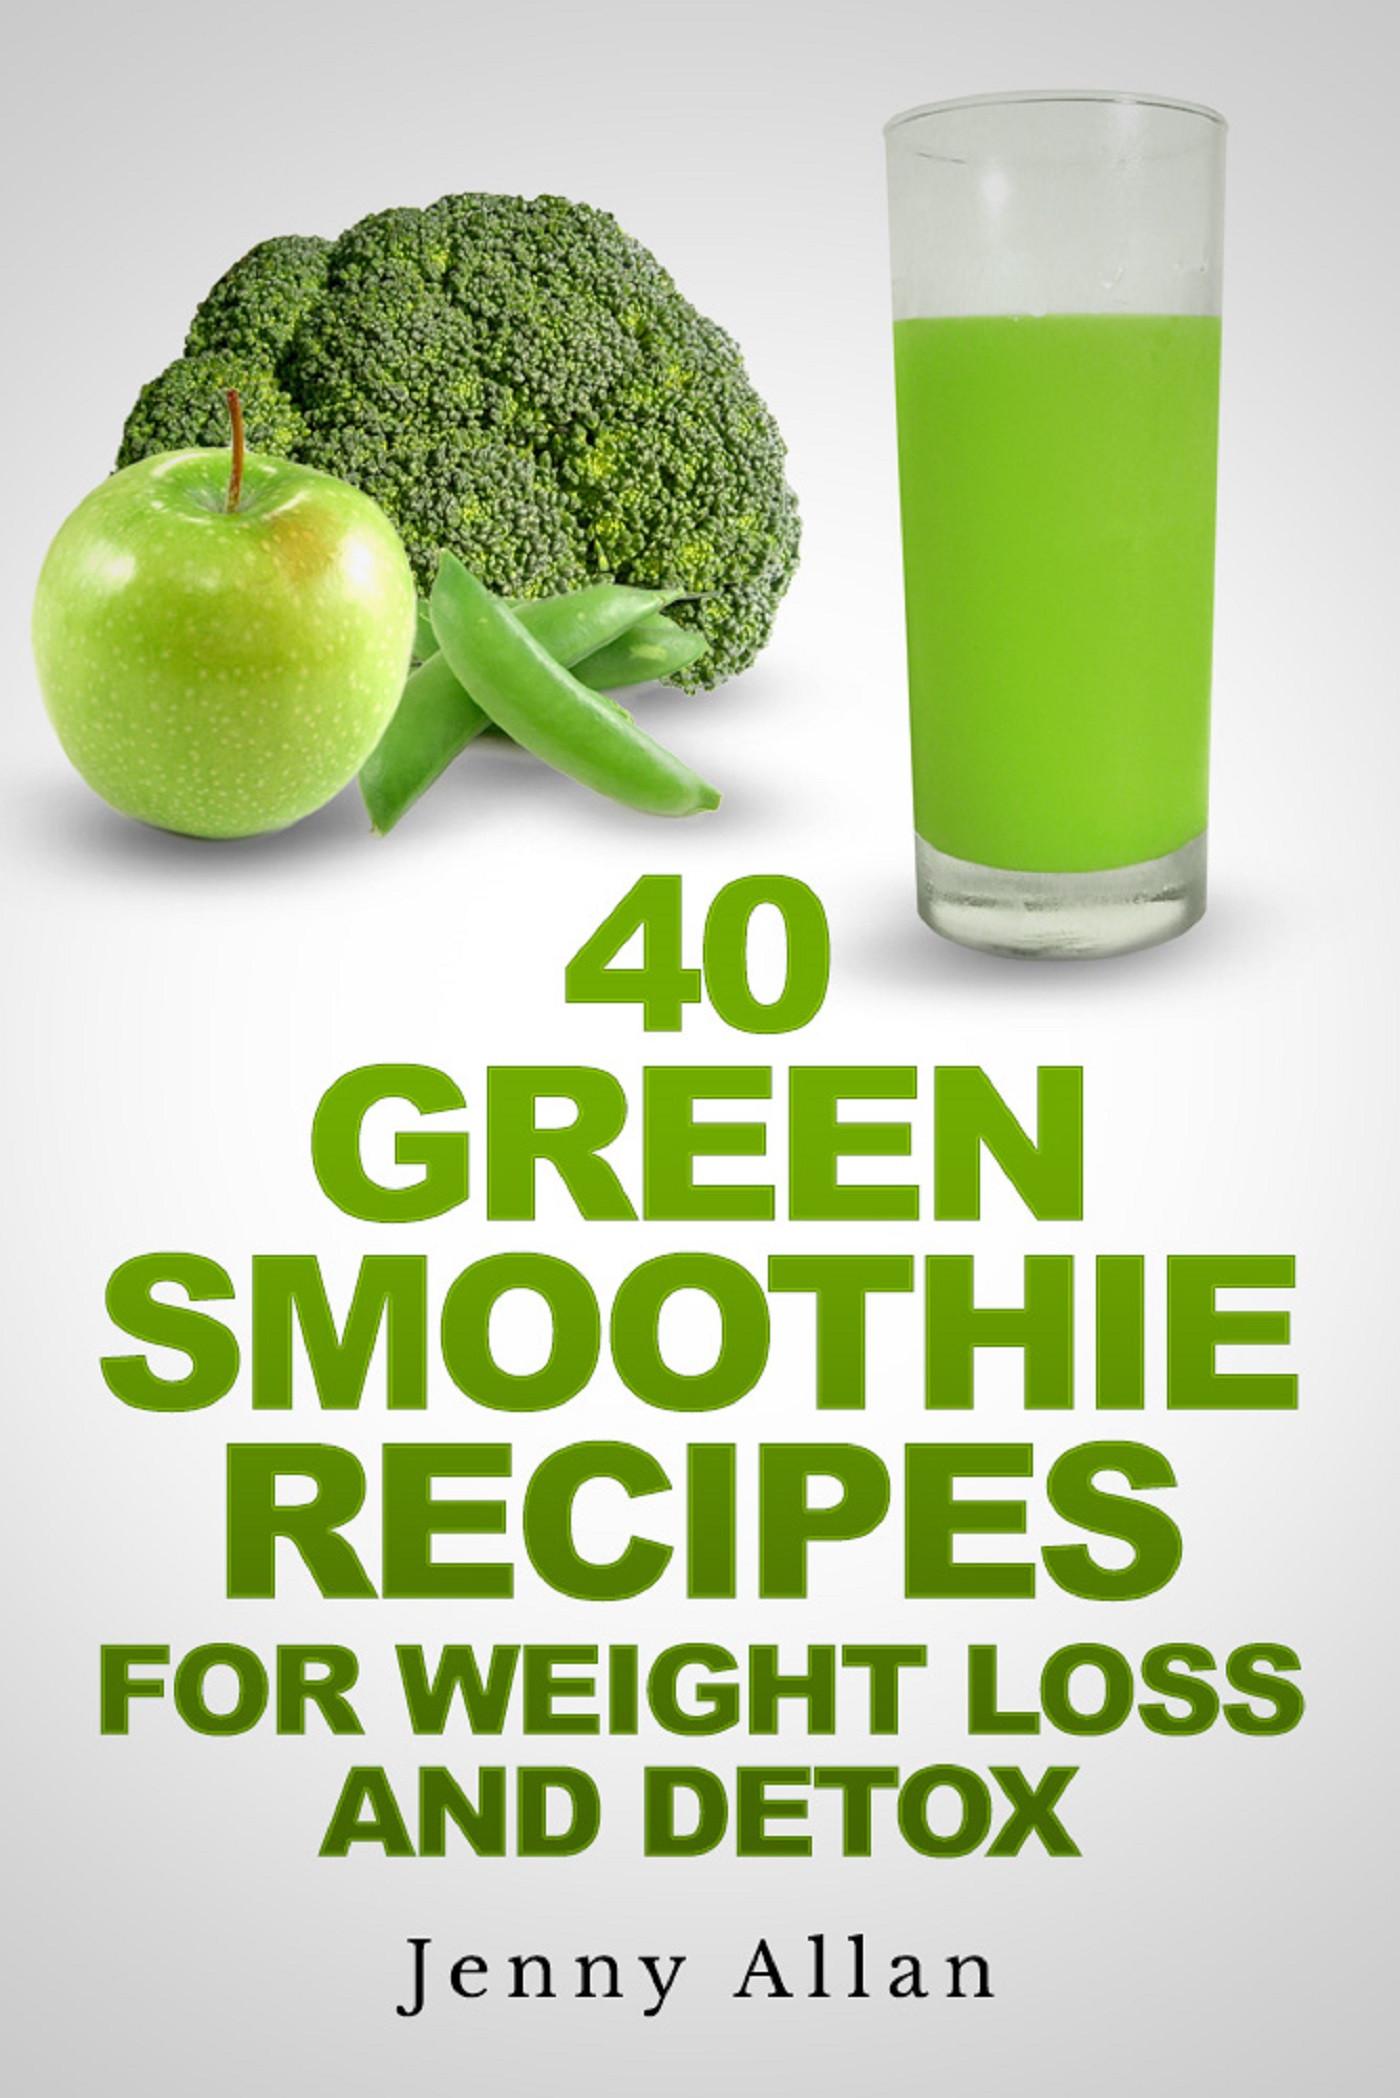 Weight Loss Smoothie Recipes  Smashwords – 40 Green Smoothie Recipes For Weight Loss and